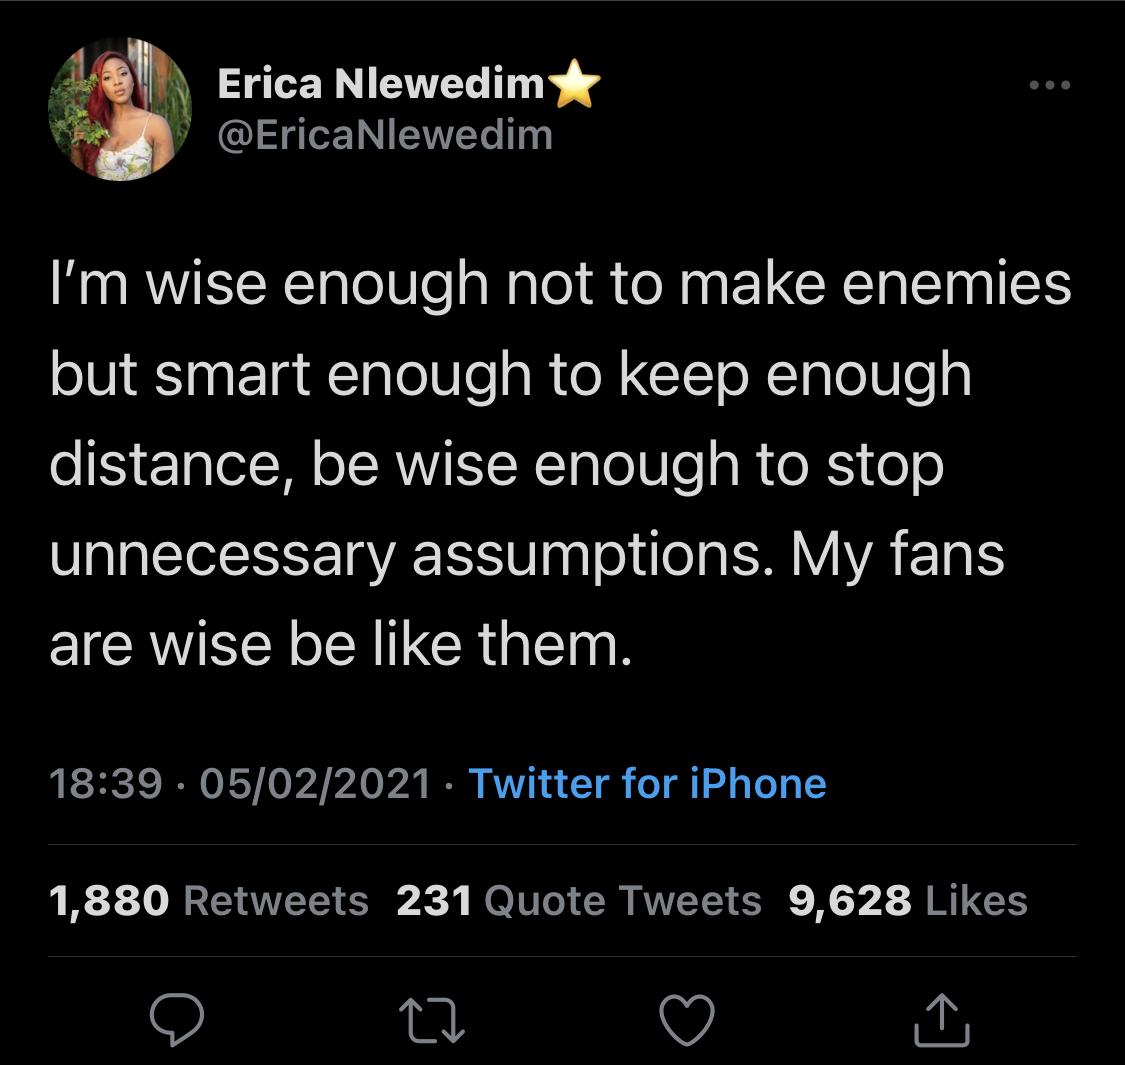 Erica Nlewedim